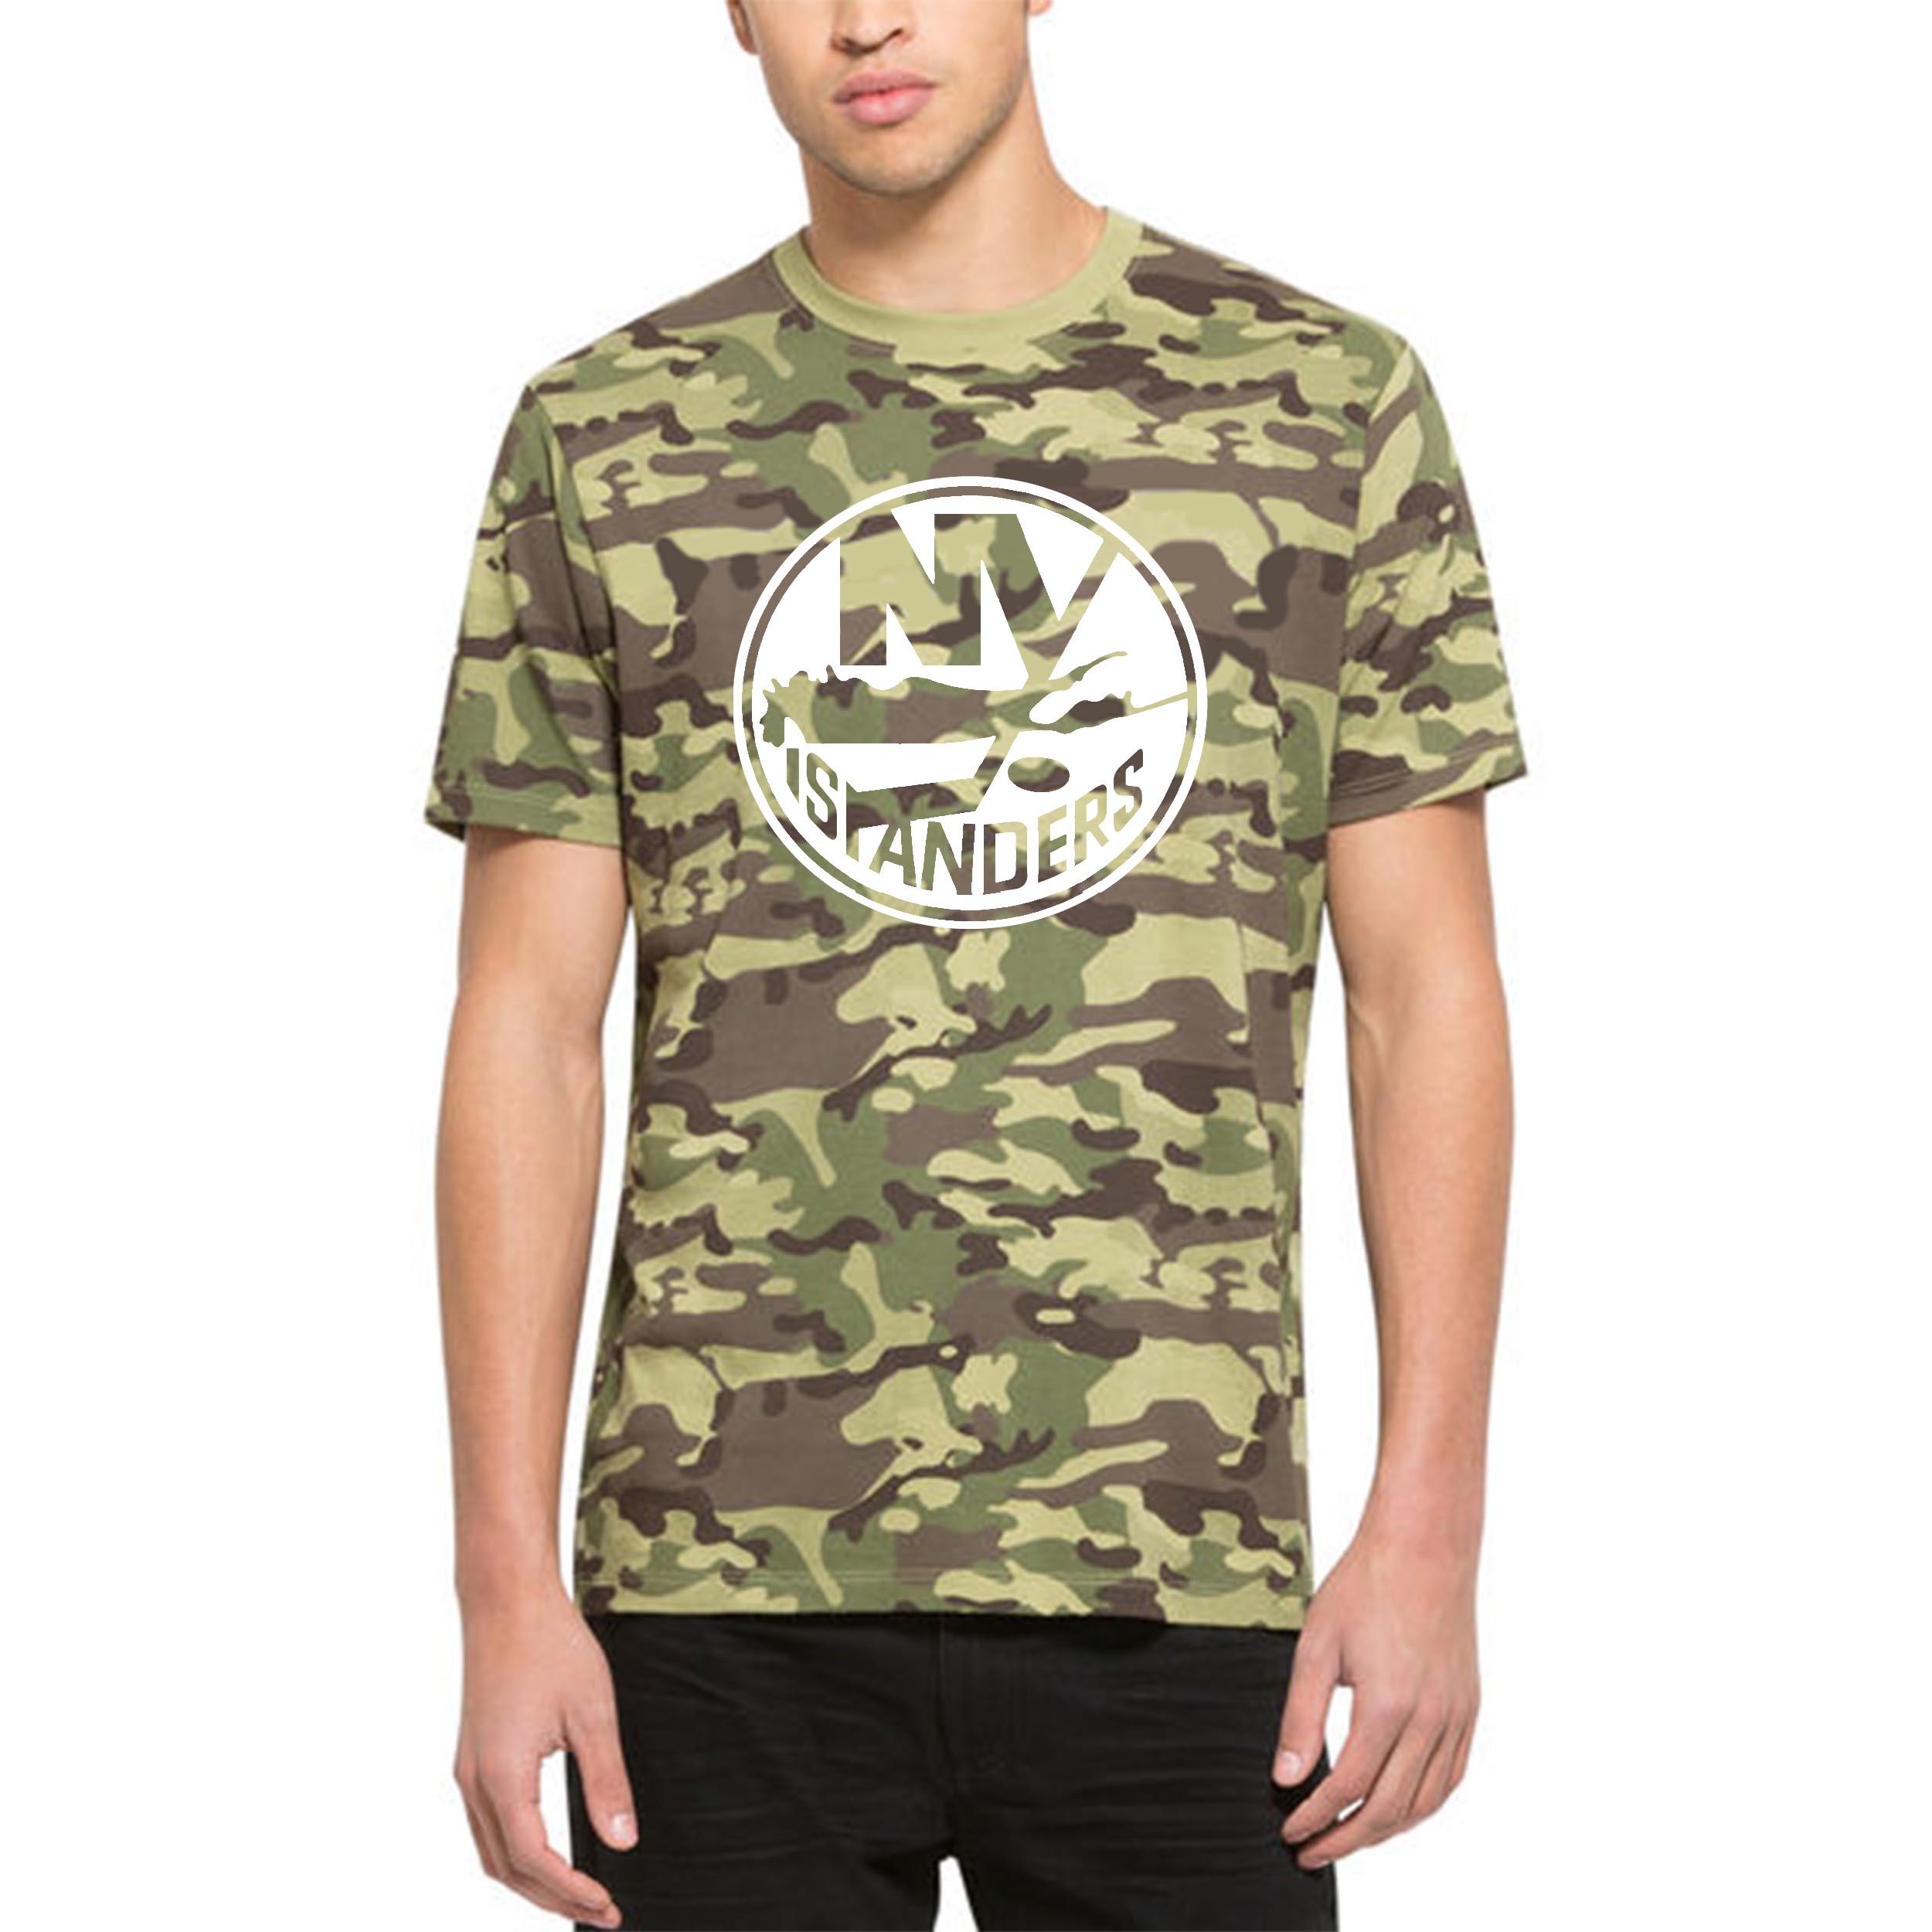 New York Islanders '47 Alpha T-Shirt Camo